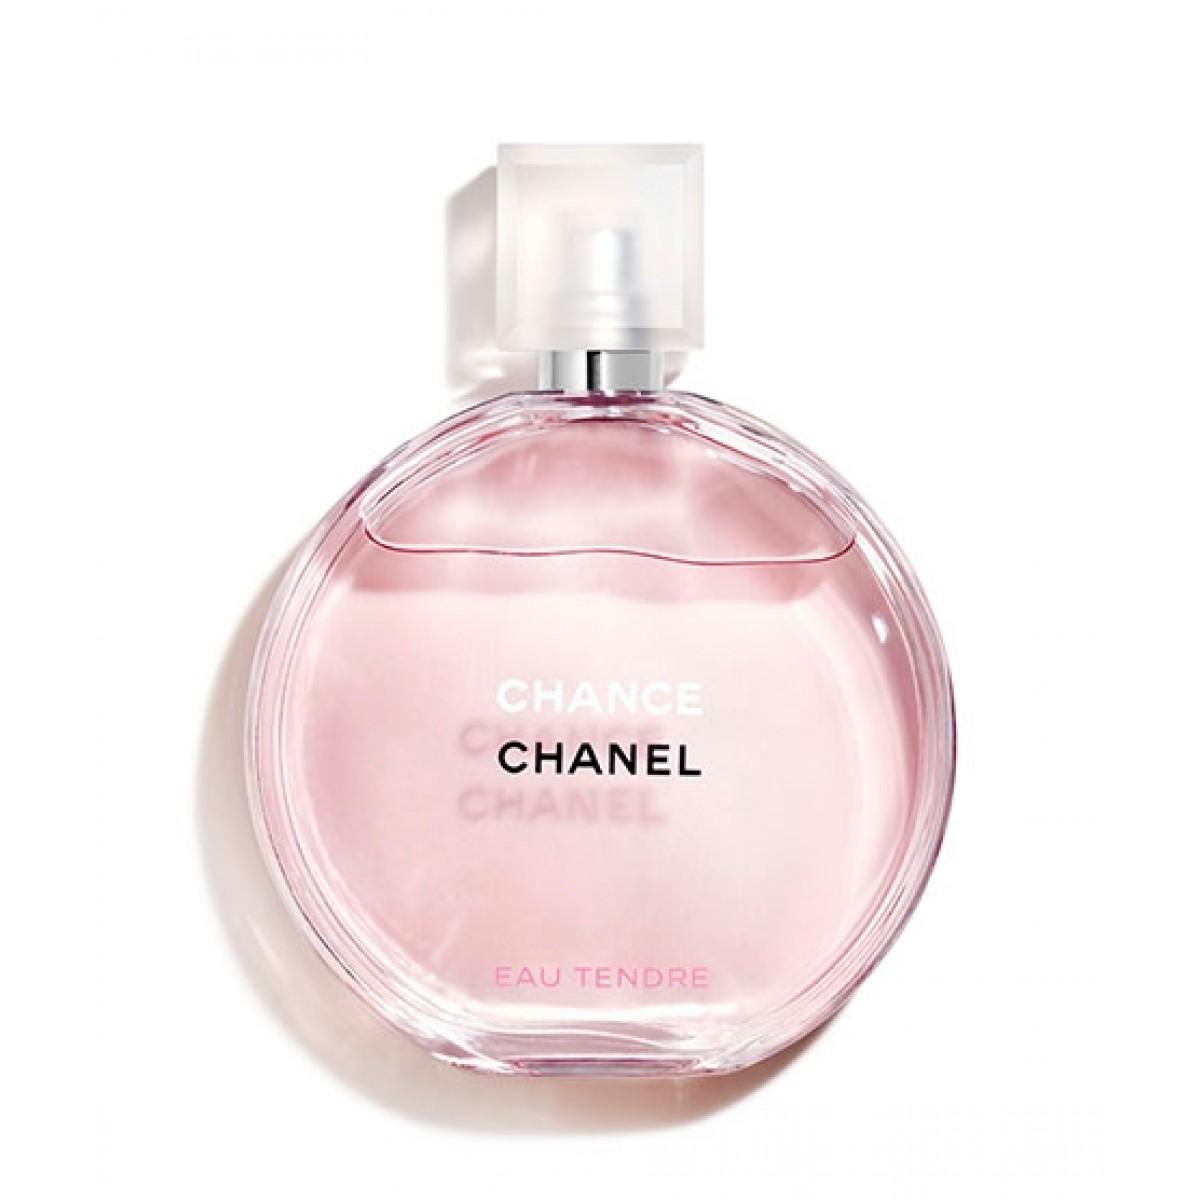 4385461a633 Chanel Chance Eau Tendre Eau De Toilette Price in Pakistan